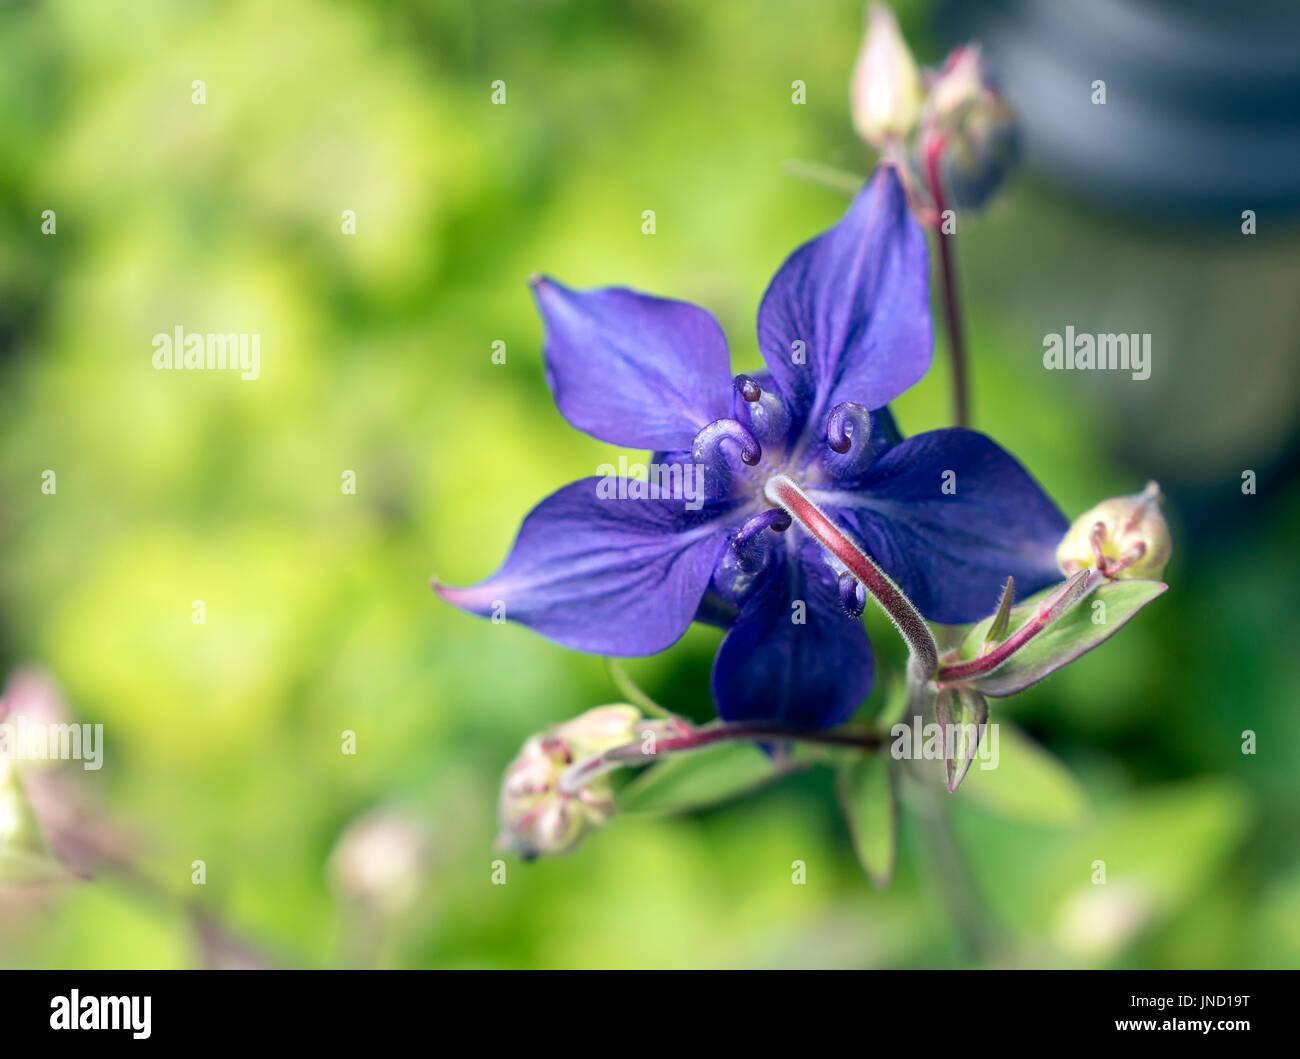 Underside of a bluish purple Aquilegia reveals the distinctive Columbine spurs - Stock Image